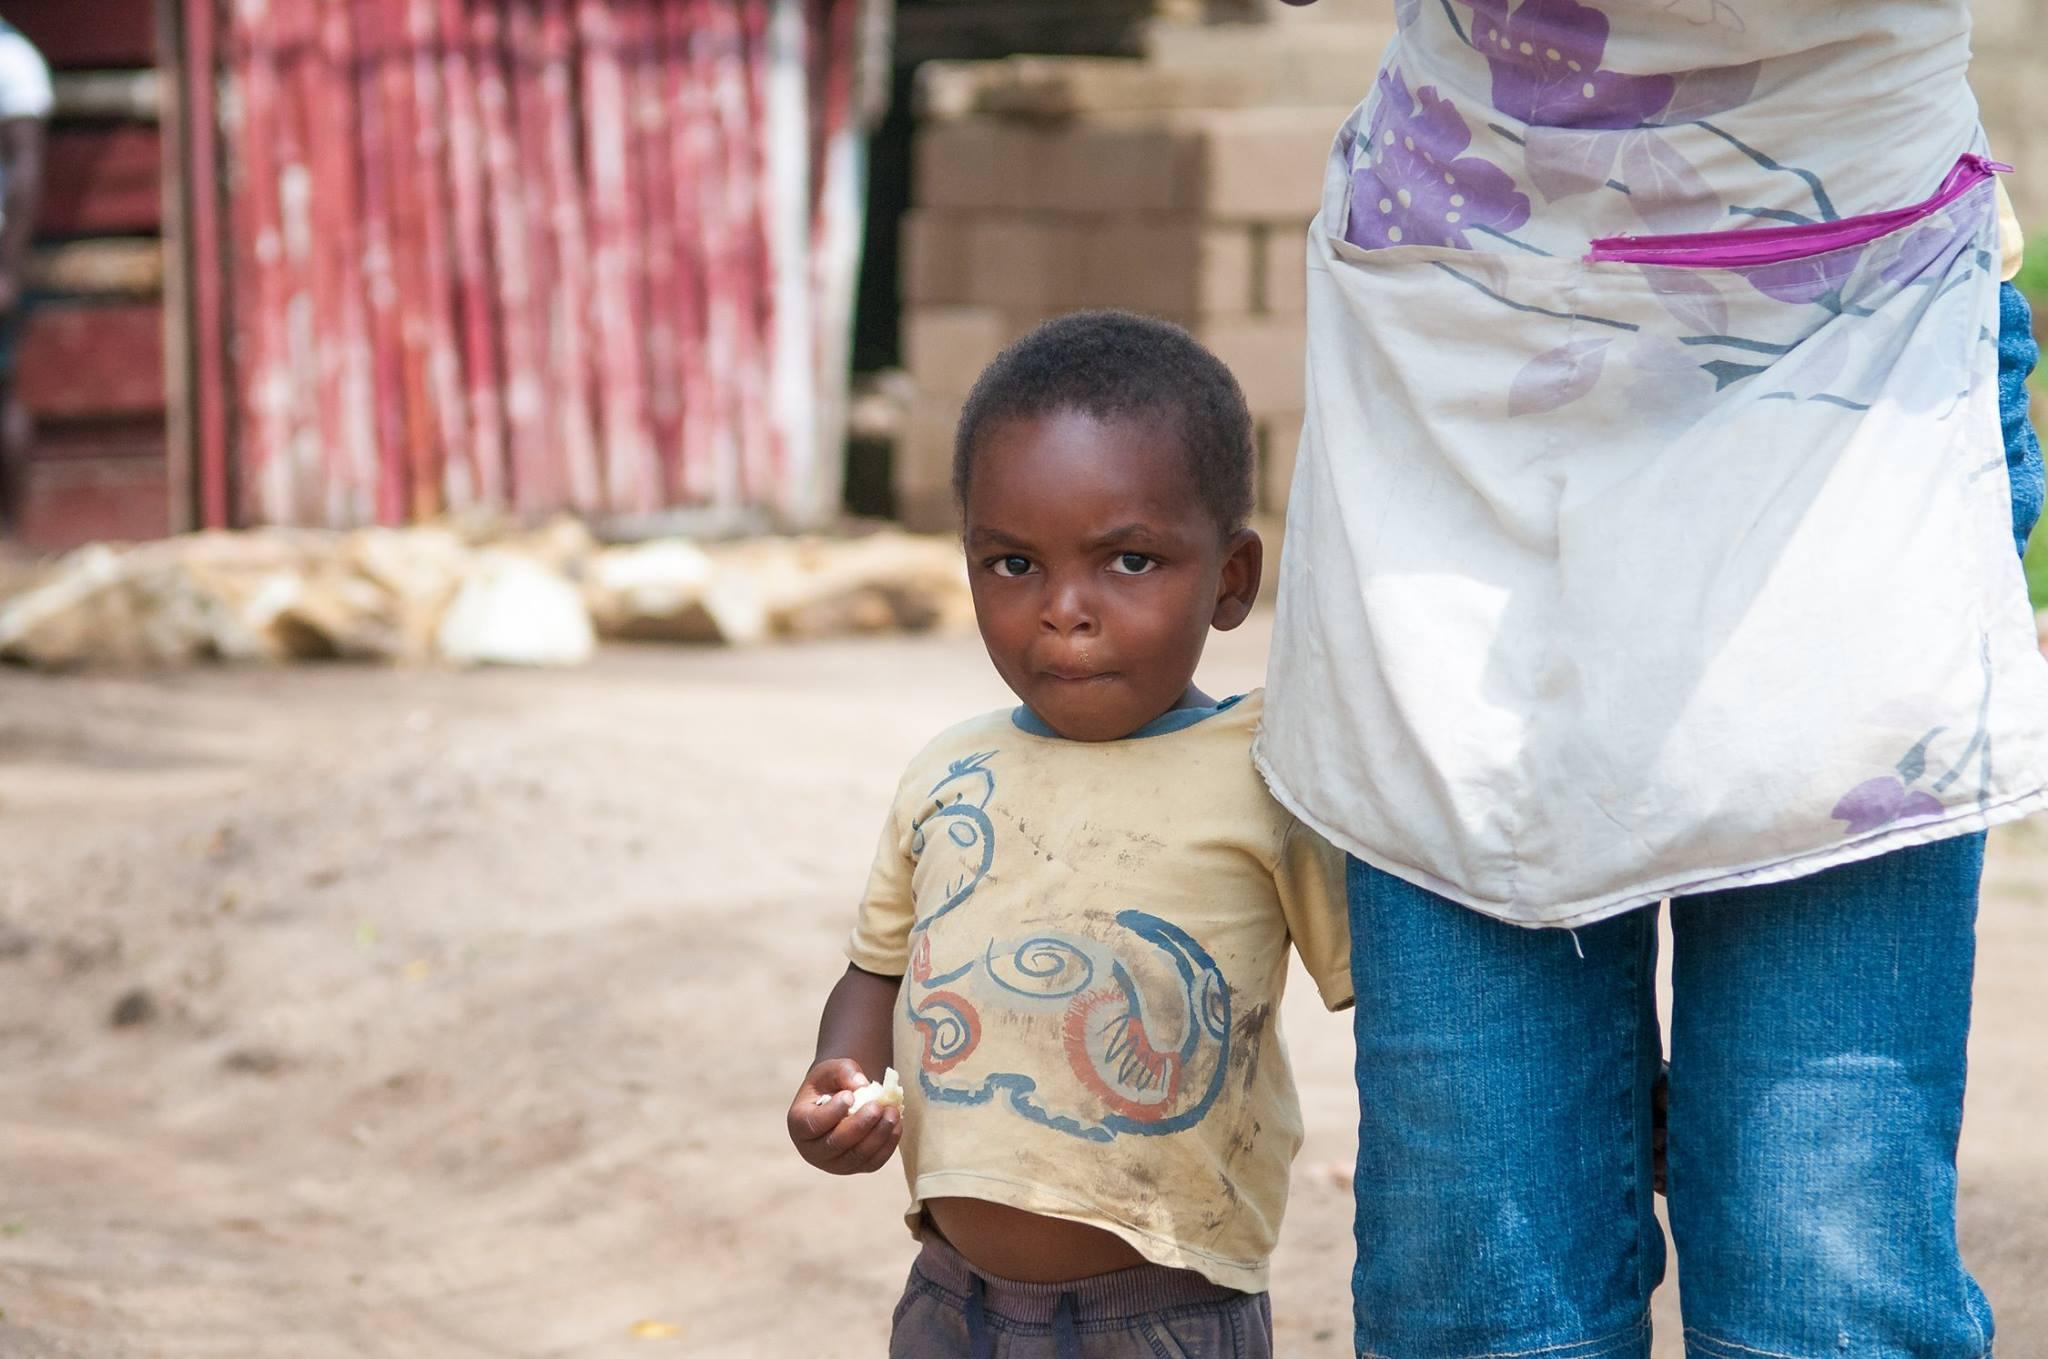 Children find hope in foster families